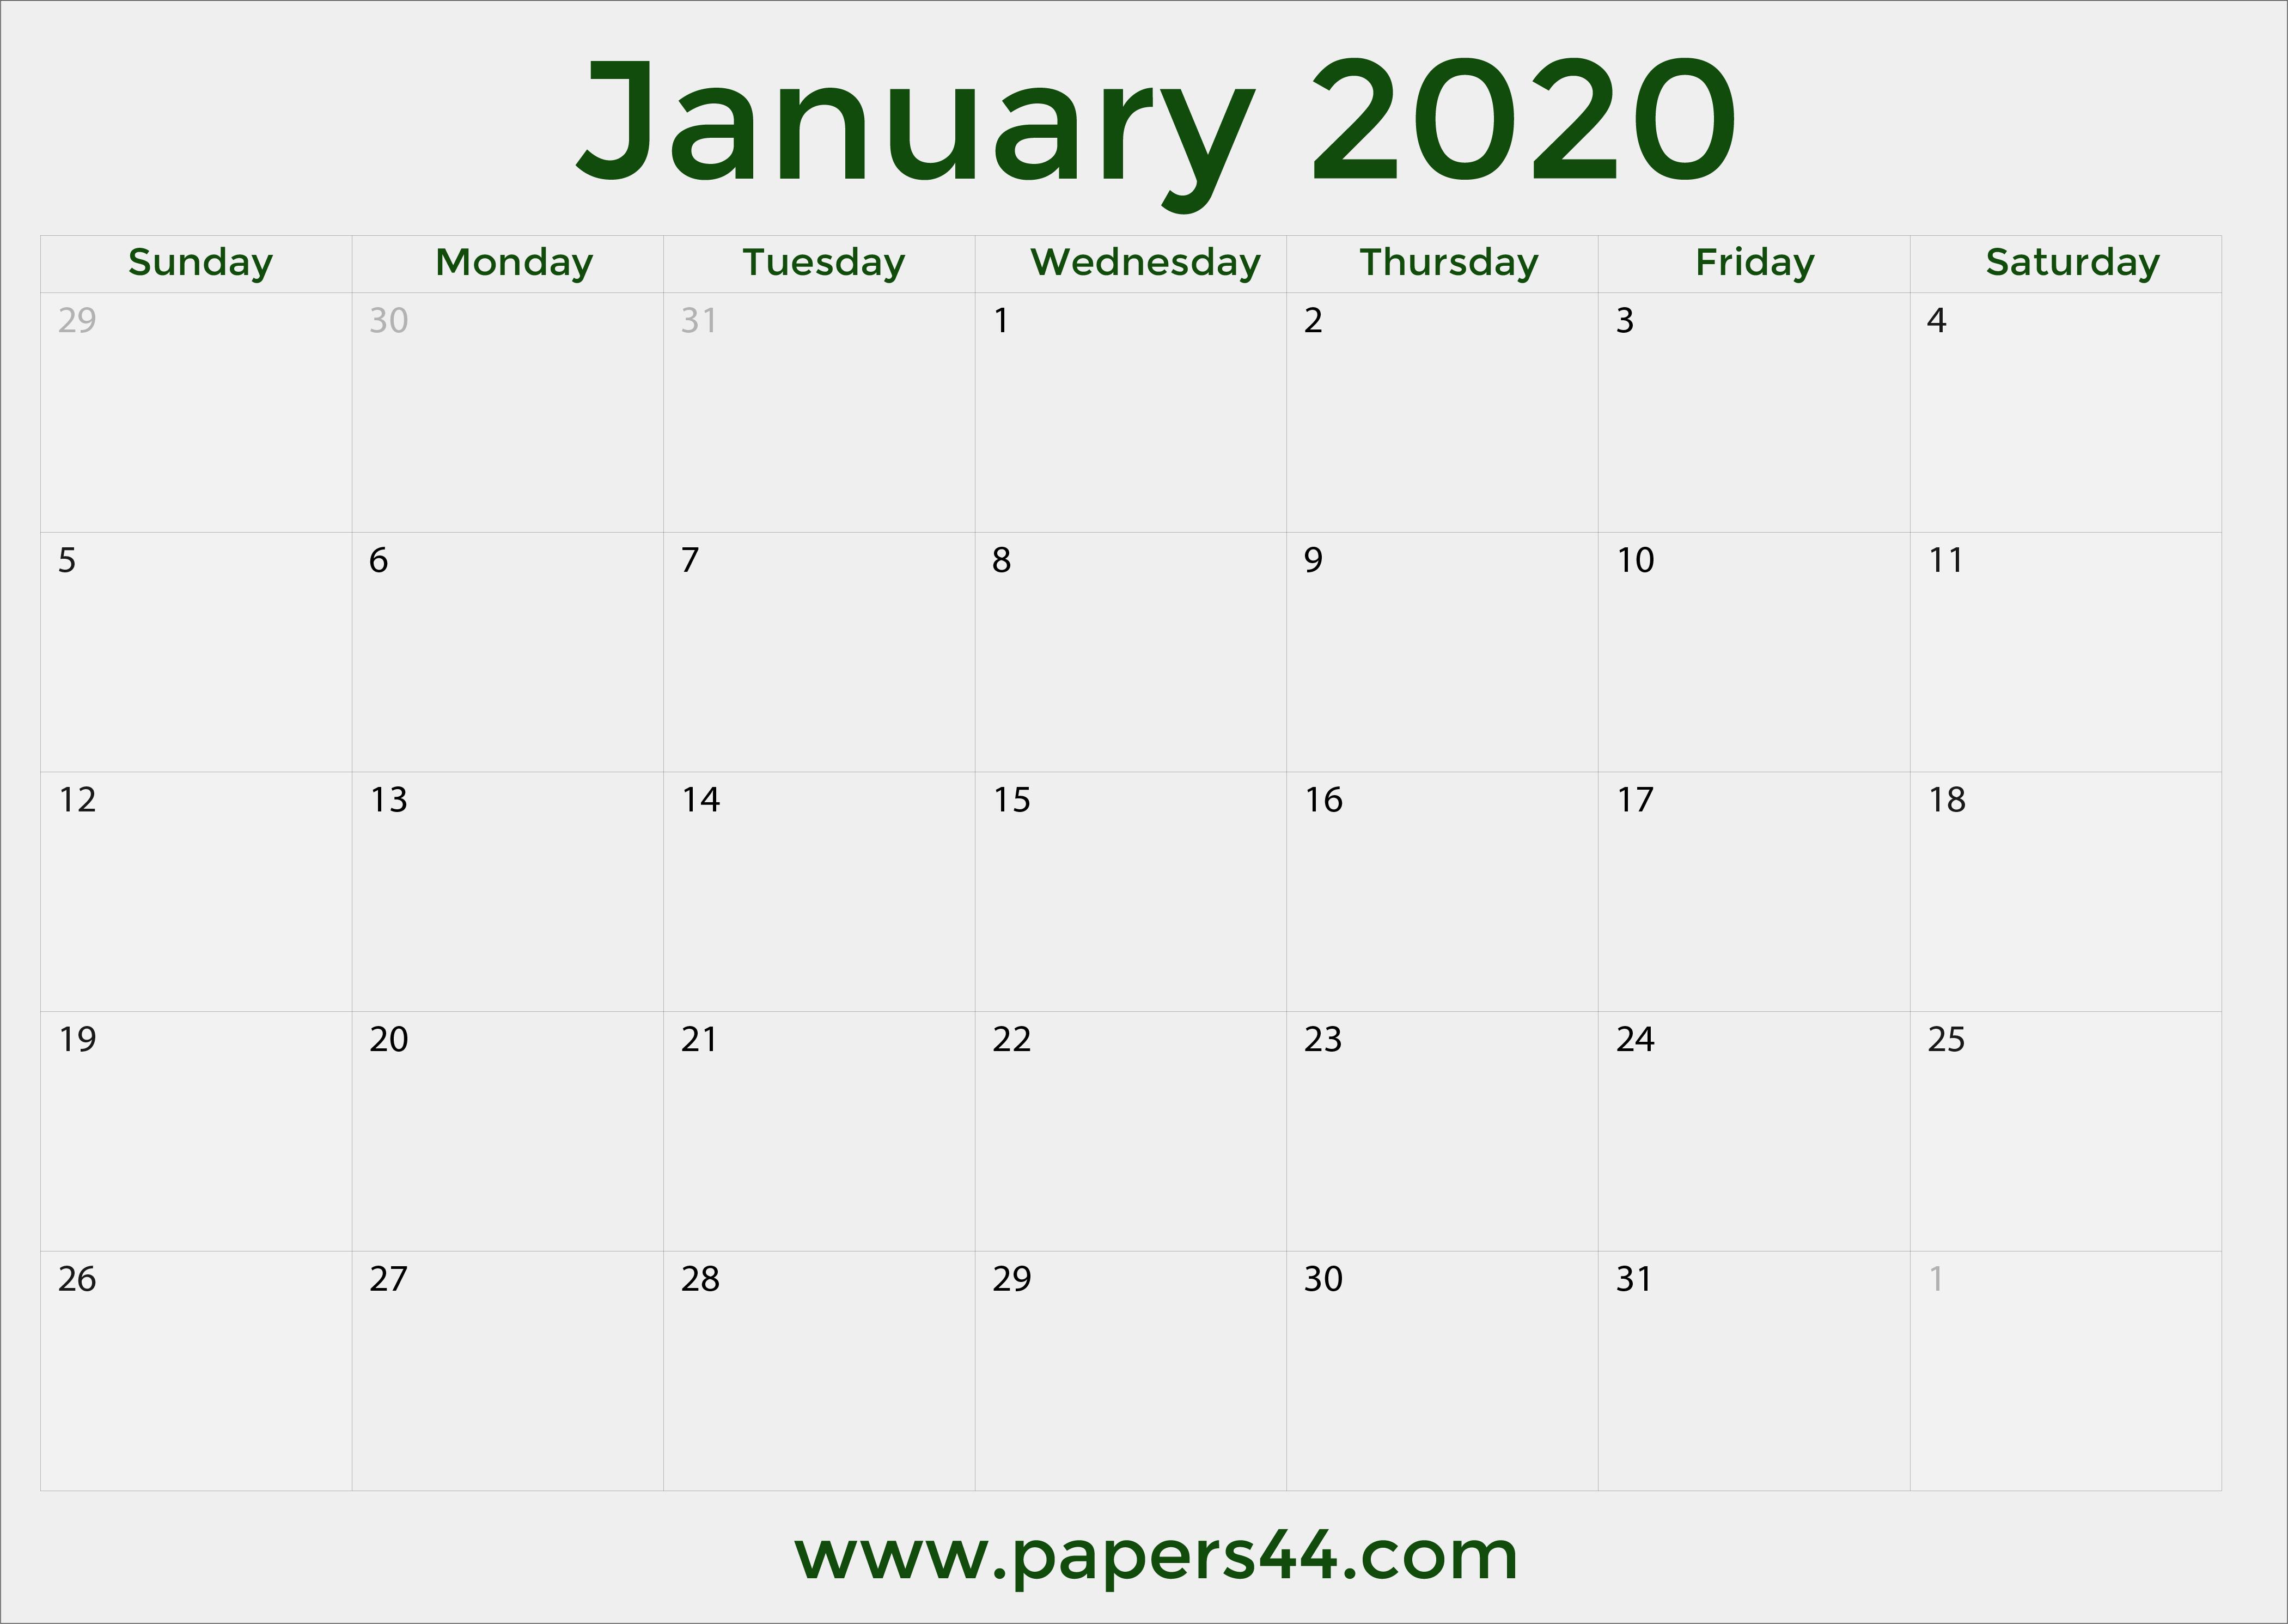 Free 2020 January Calendars - Pdf For Full Page January Calendar